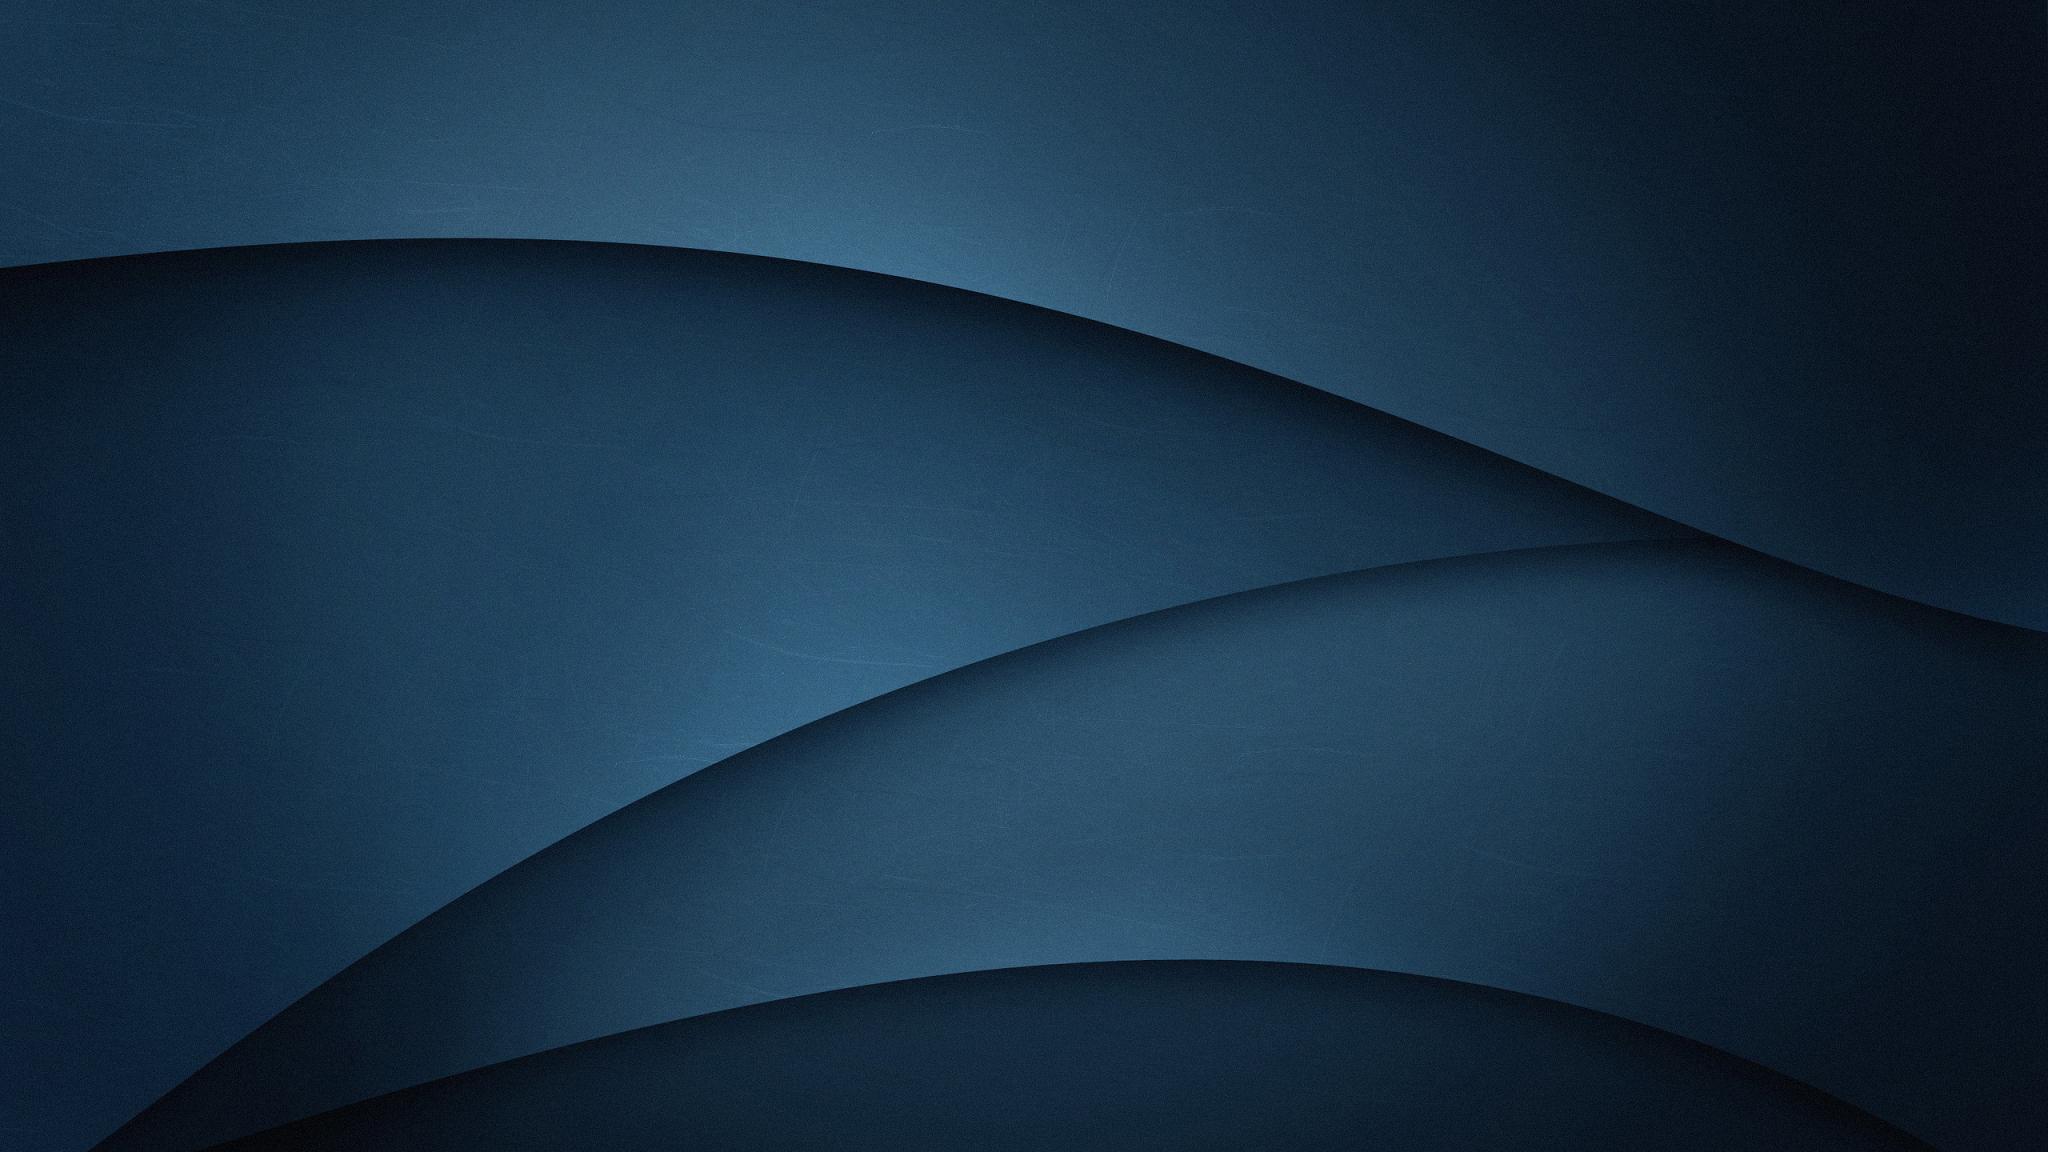 Dark Blue, Gradient, Abstract, Wave Flow, Minimalist, 2048X1152 Wallpaper